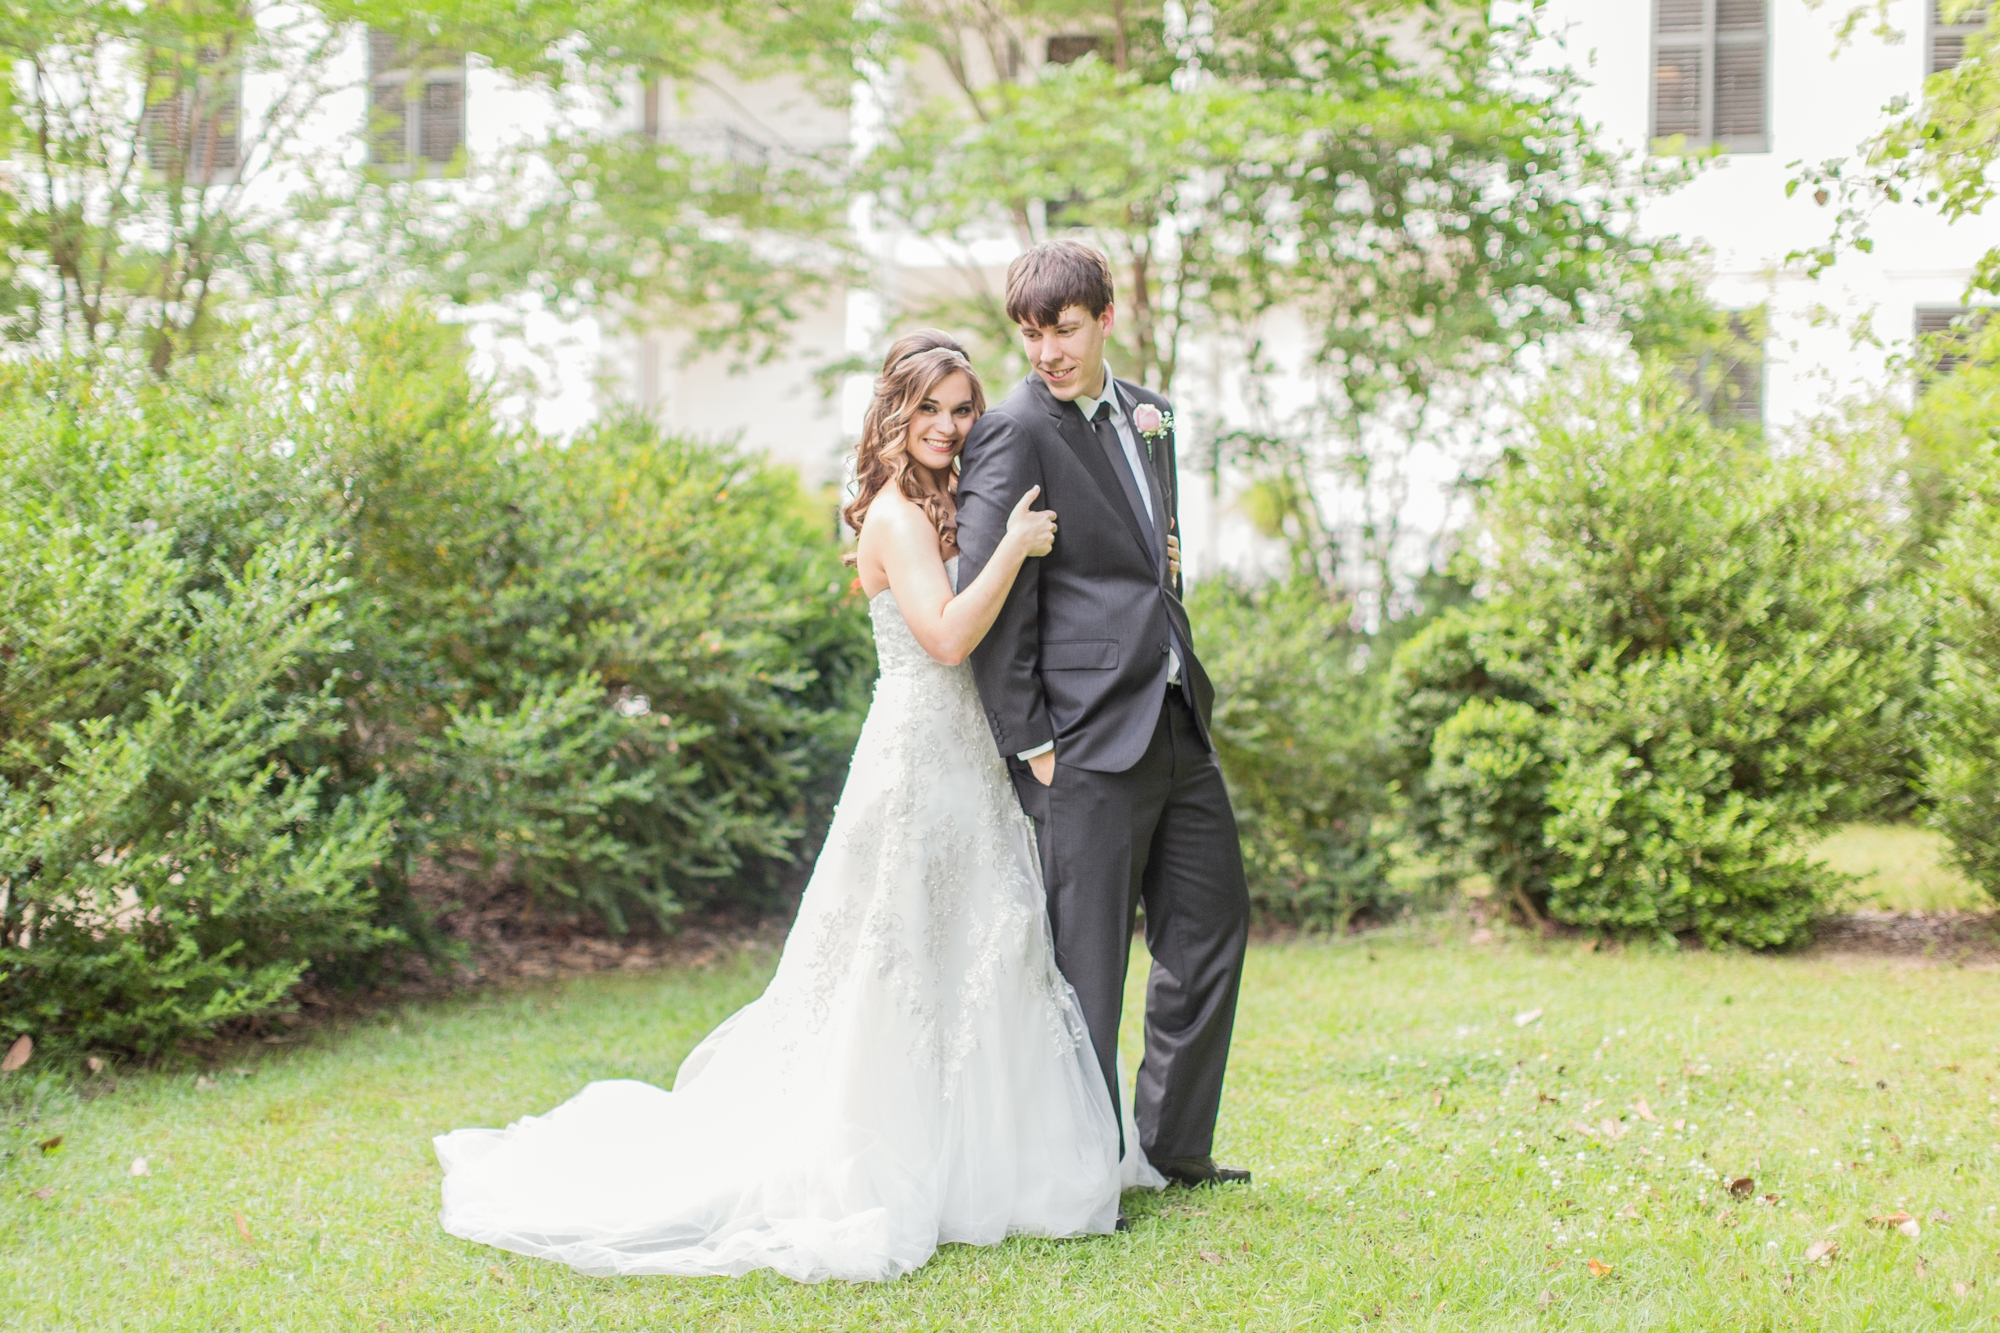 hendersonwedding-189.jpg